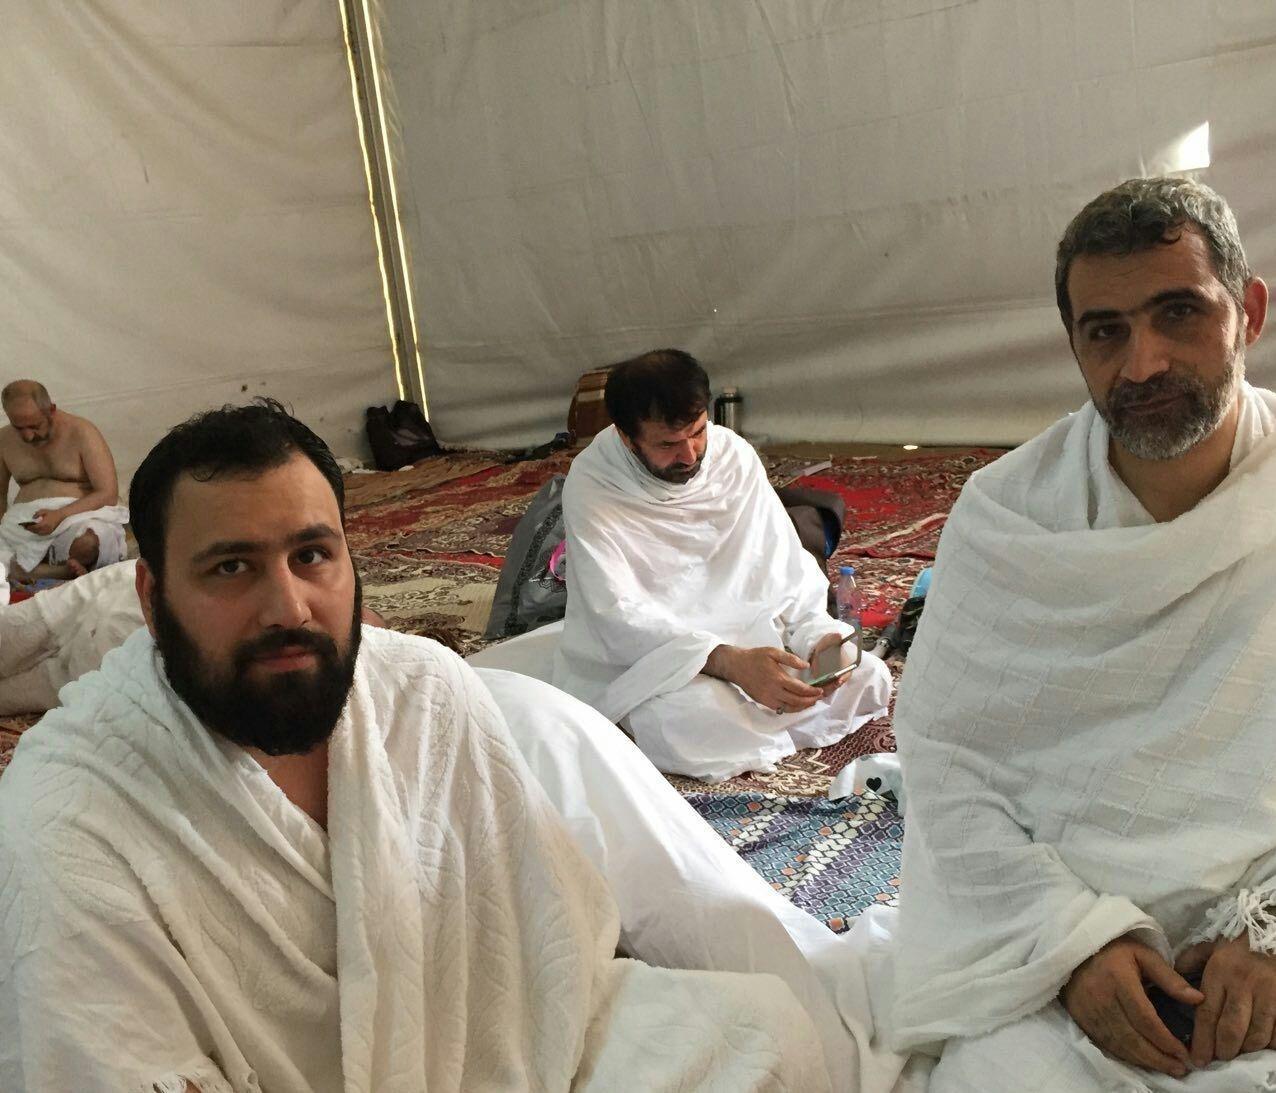 نوه امام خمینی در لباس احرام / عکس